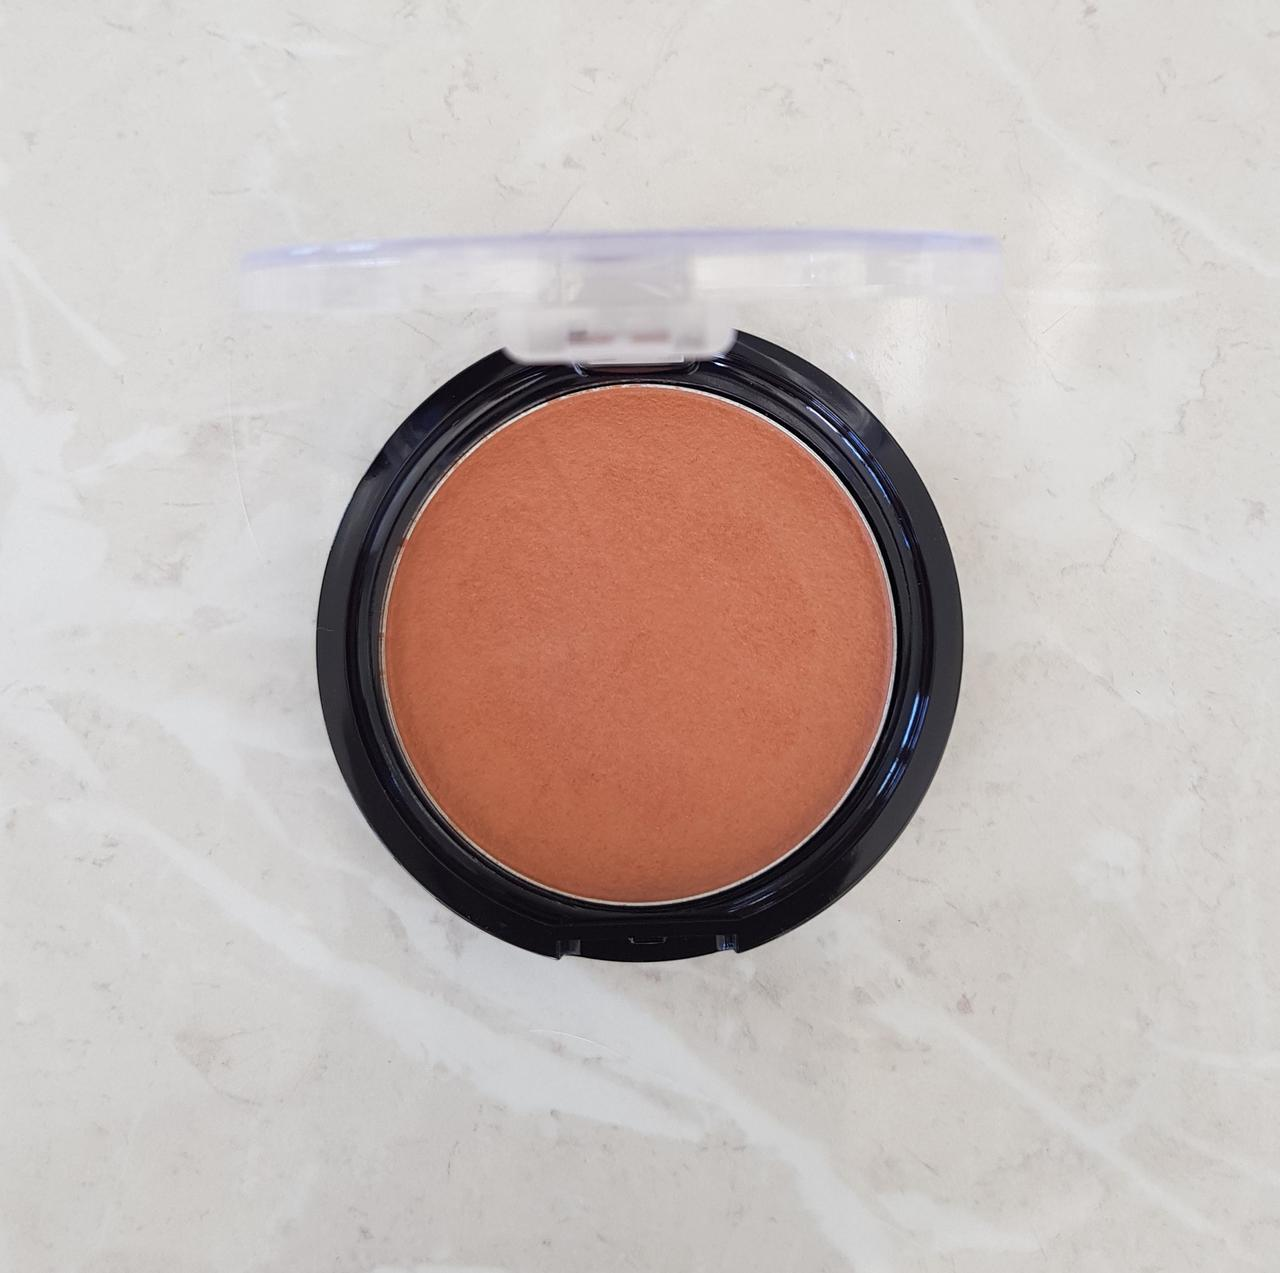 Baked Blush/Bronzer